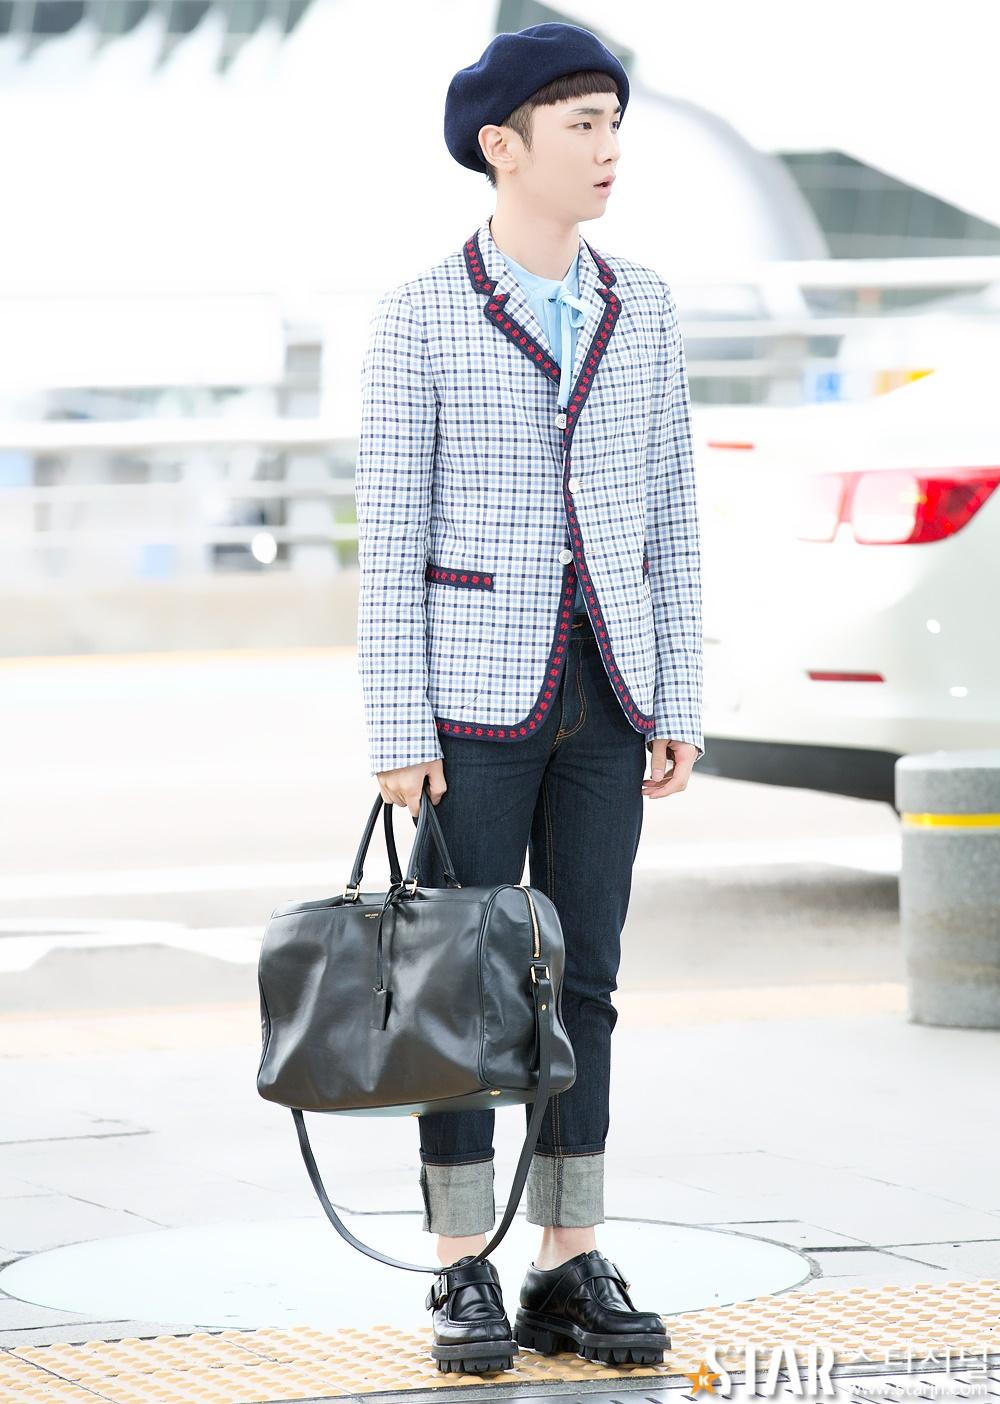 [IMG/160715] Jonghyun, Key @ Aeropuerto Incheon hacia Japón. JJRU9yRI